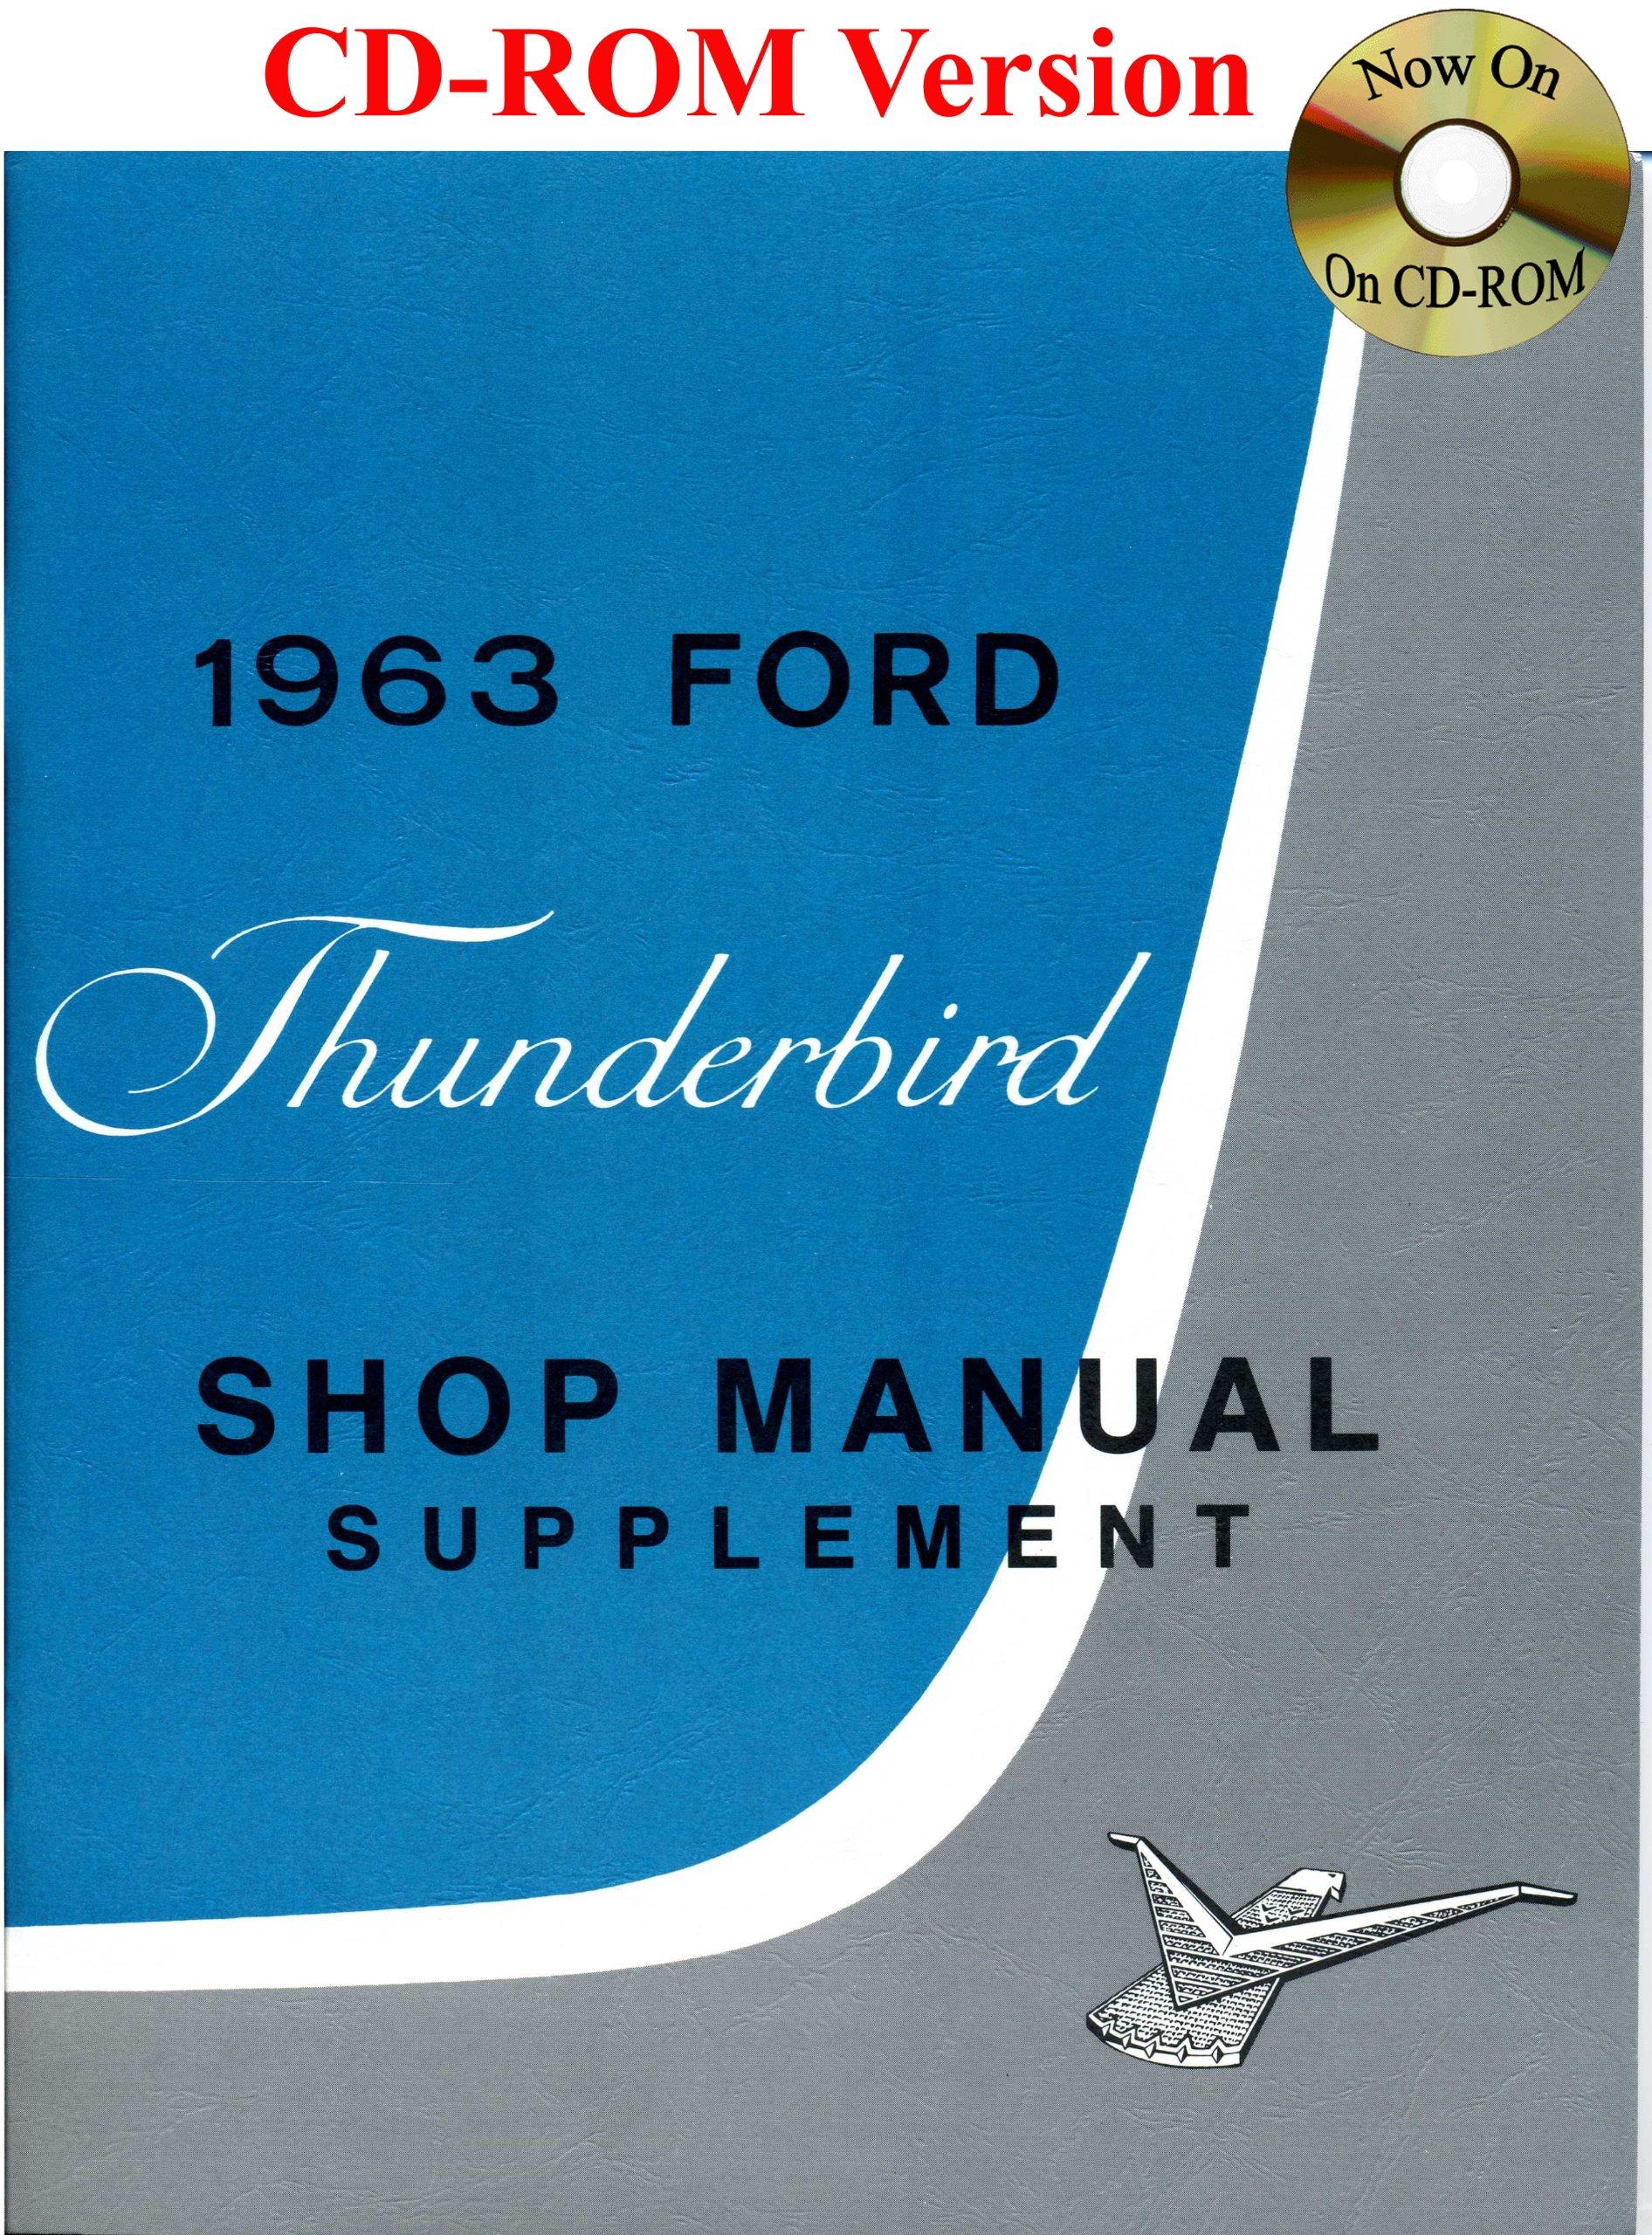 1963 Ford Thunderbird Shop Manual: Ford Motor Company, David E. LeBlanc:  9781603710138: Amazon.com: Books